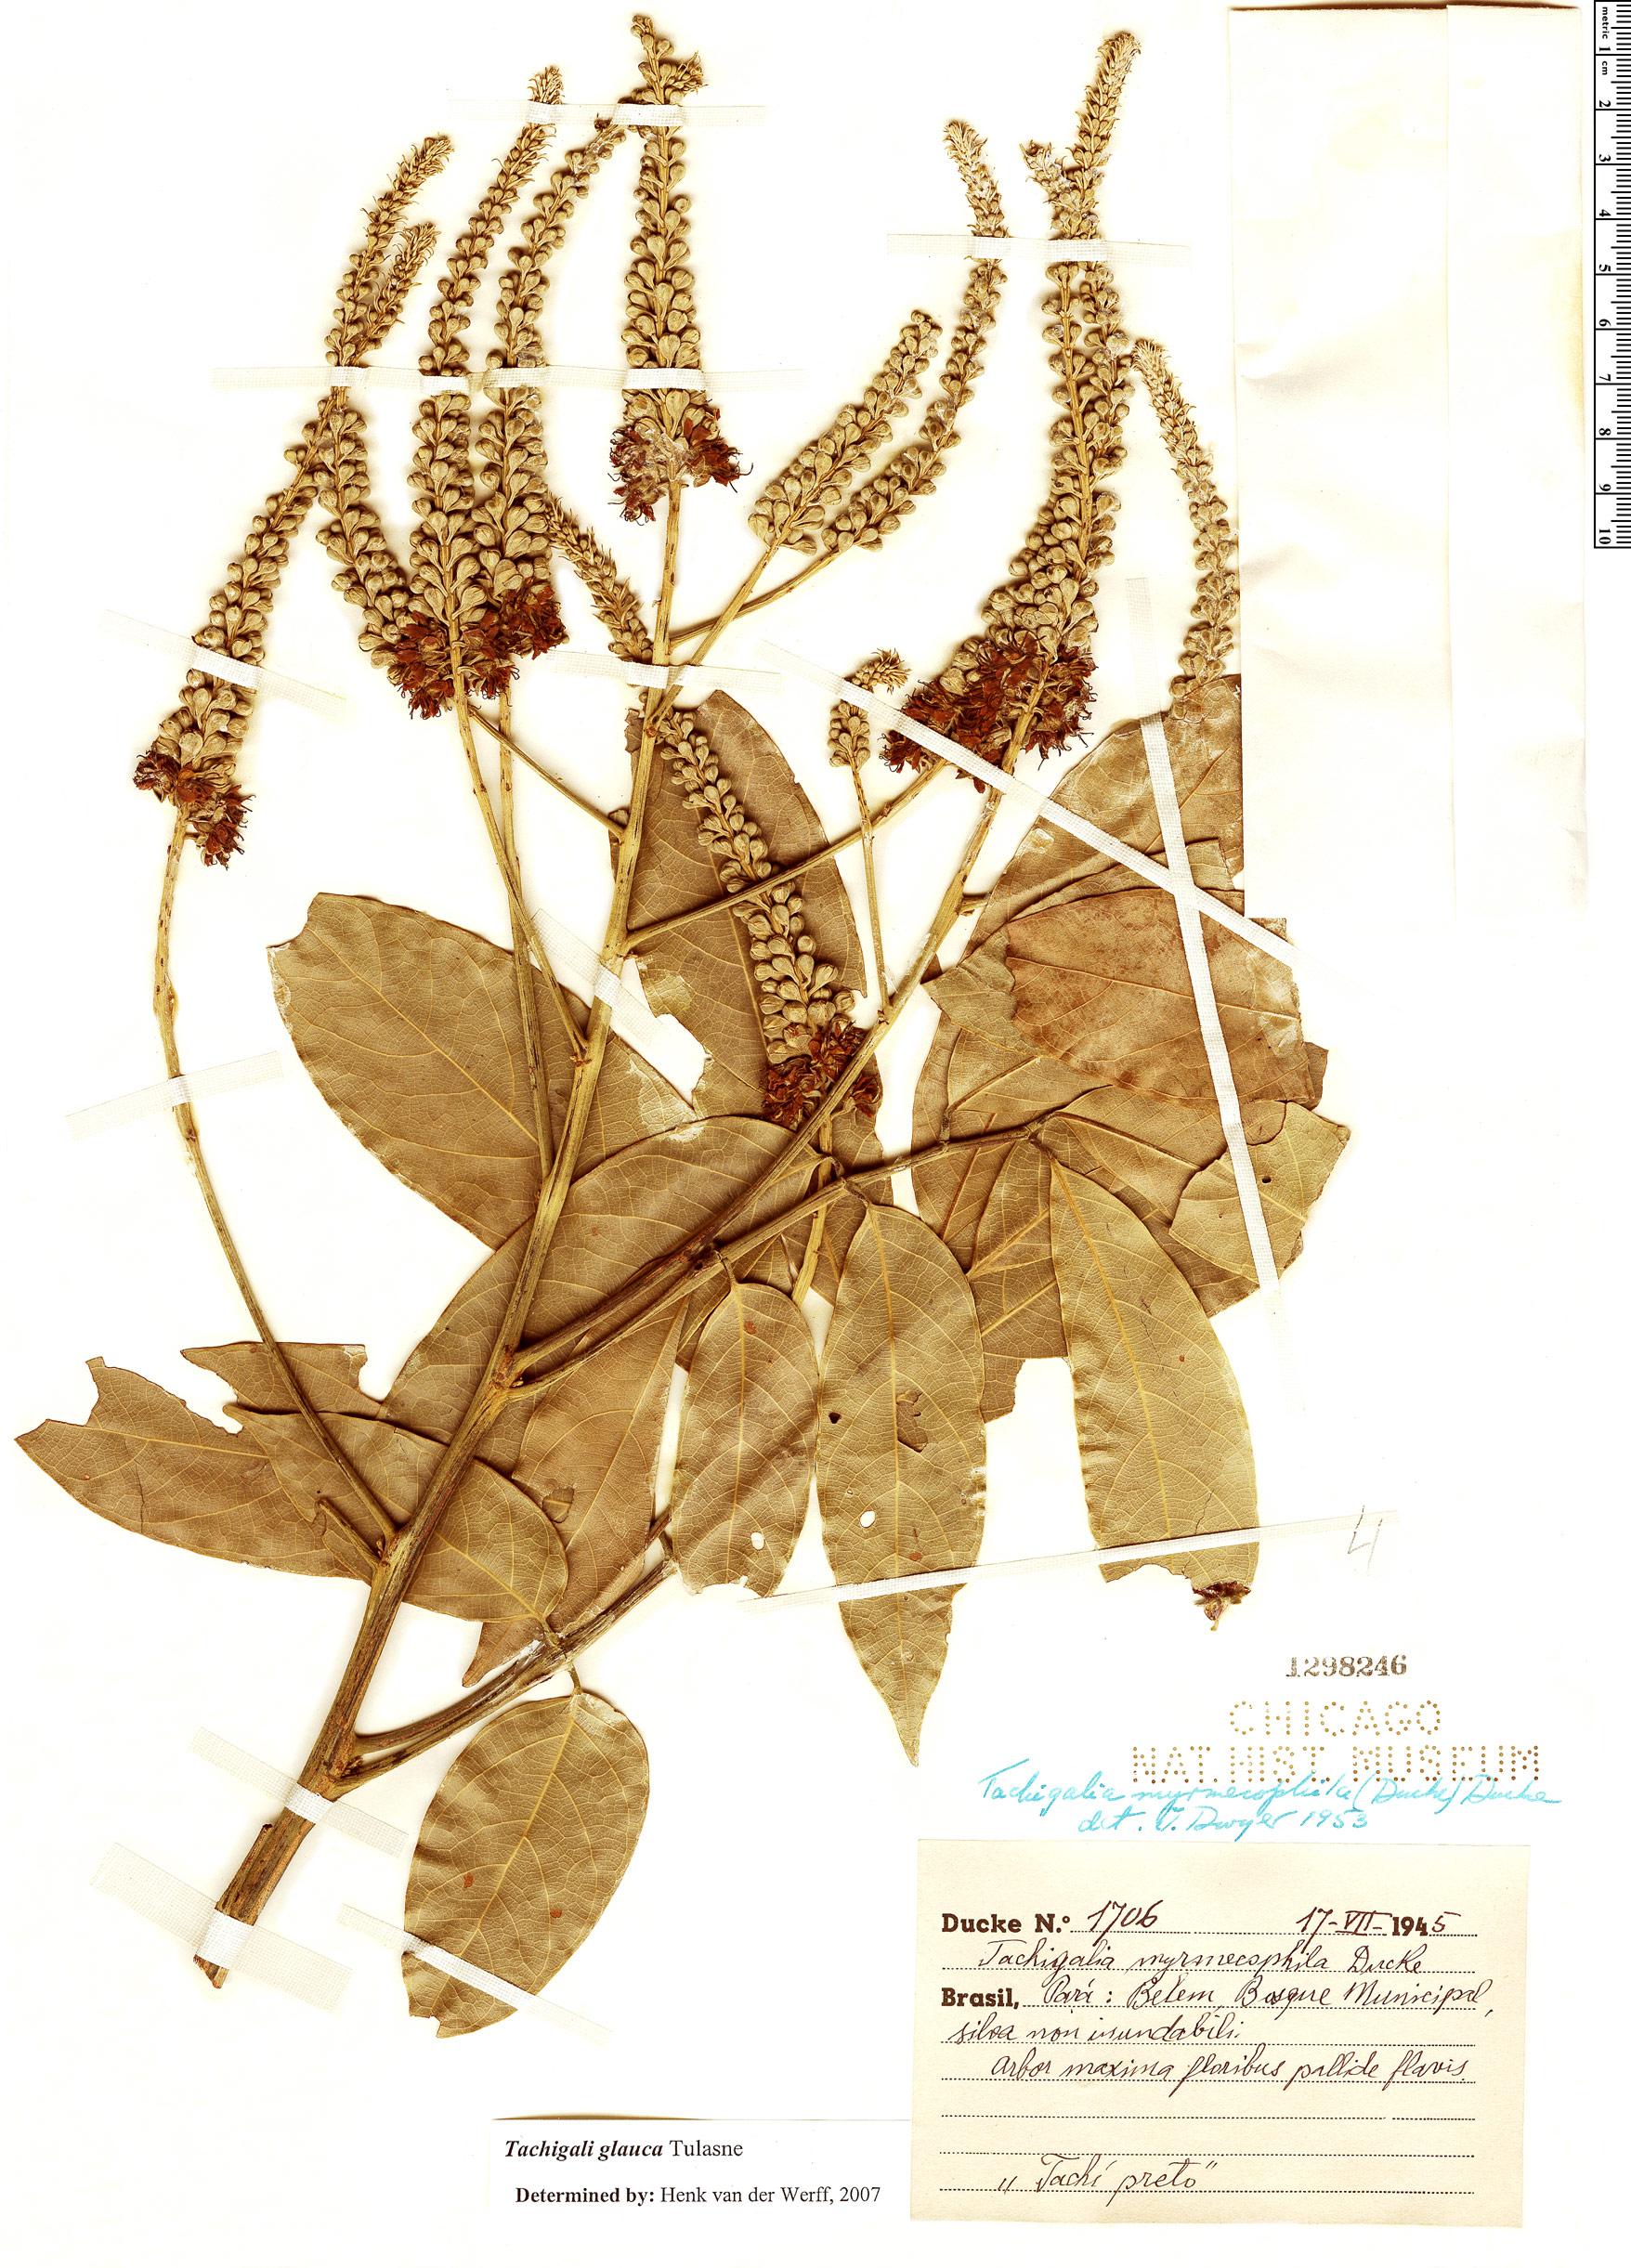 Specimen: Tachigali glauca